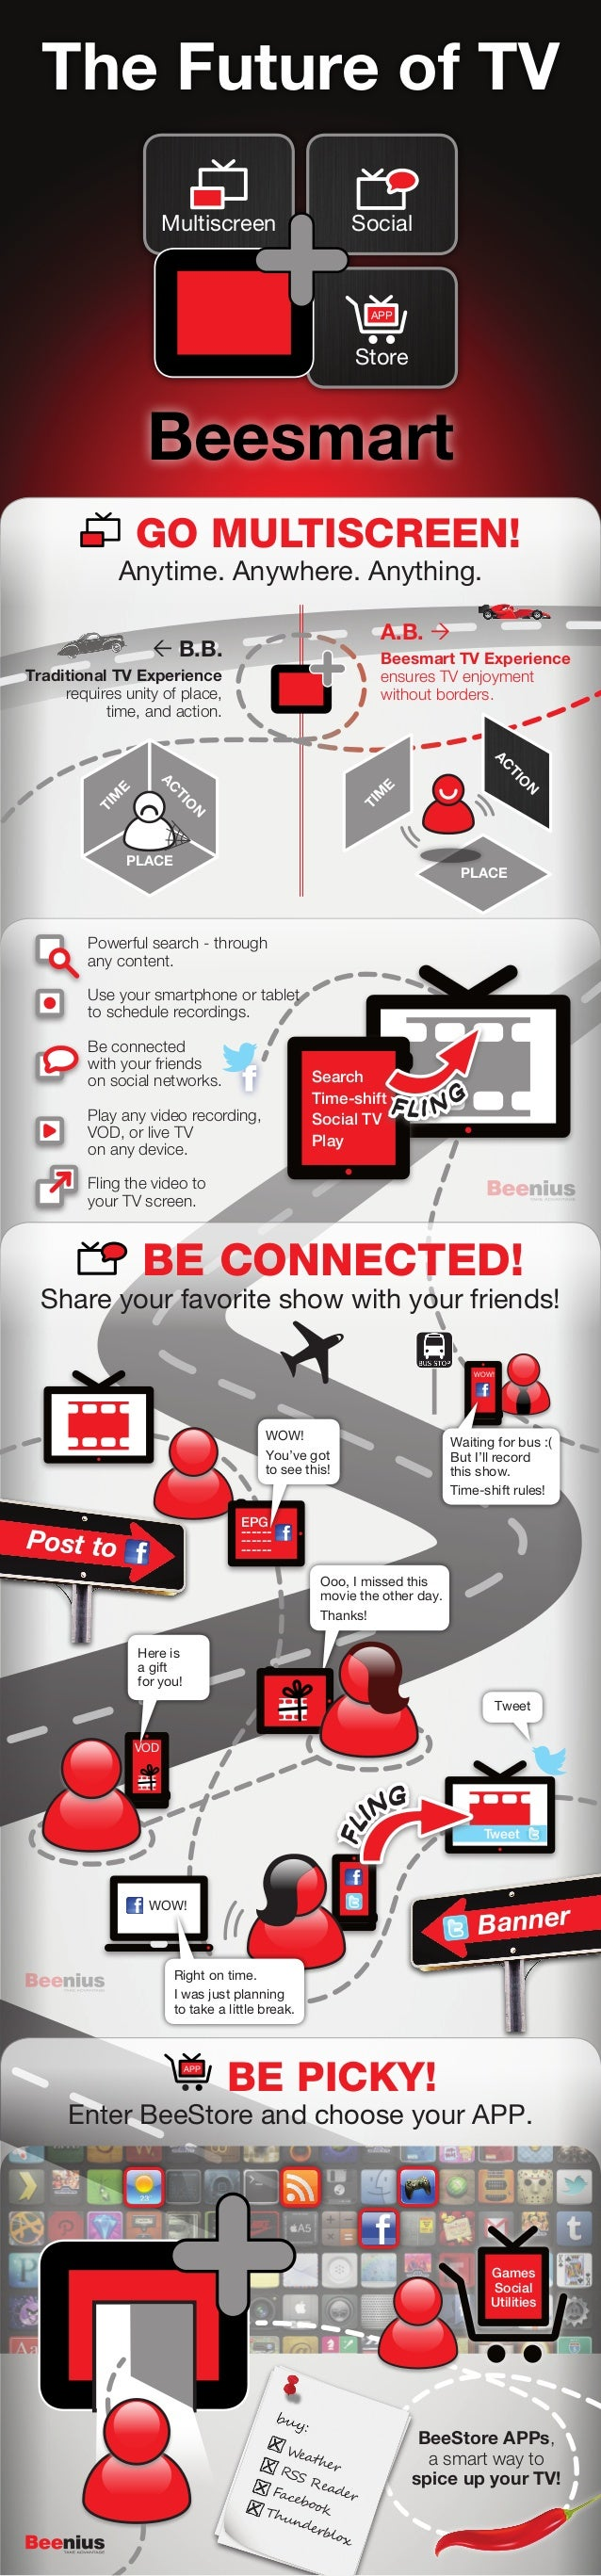 The Future of TV                      Multiscreen                       Social                                            ...